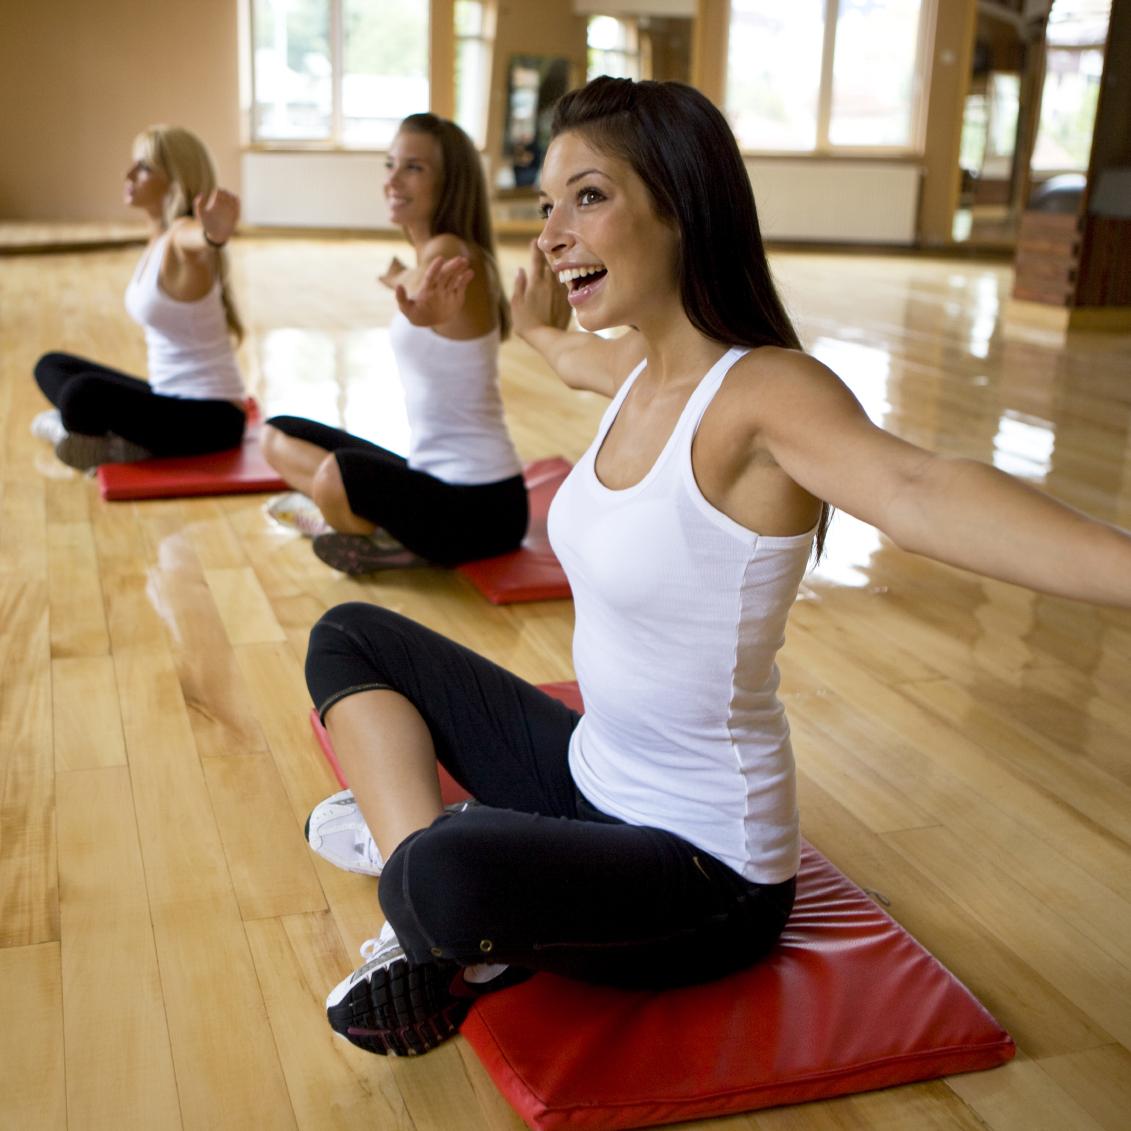 Pop Physique / Silverlake Yoga / Body Builders Gym / Still Yoga / Pilates Plus / Silverlake Reservoir / Griffith Park Trails -